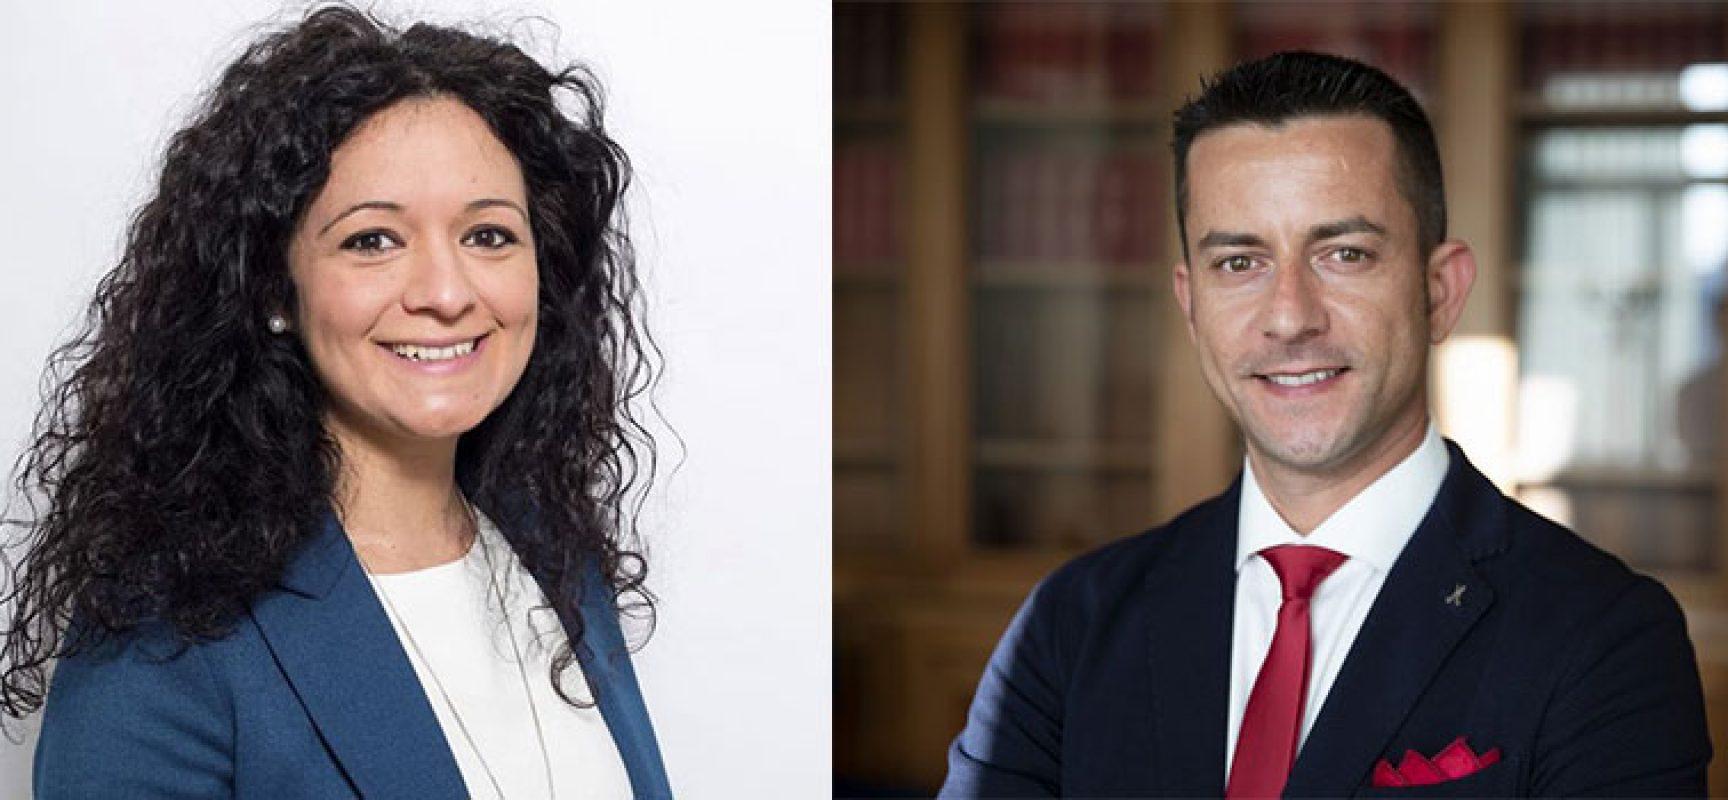 Punto nascite ospedale Bisceglie: Galizia accusa Emiliano, dura replica di Galantino